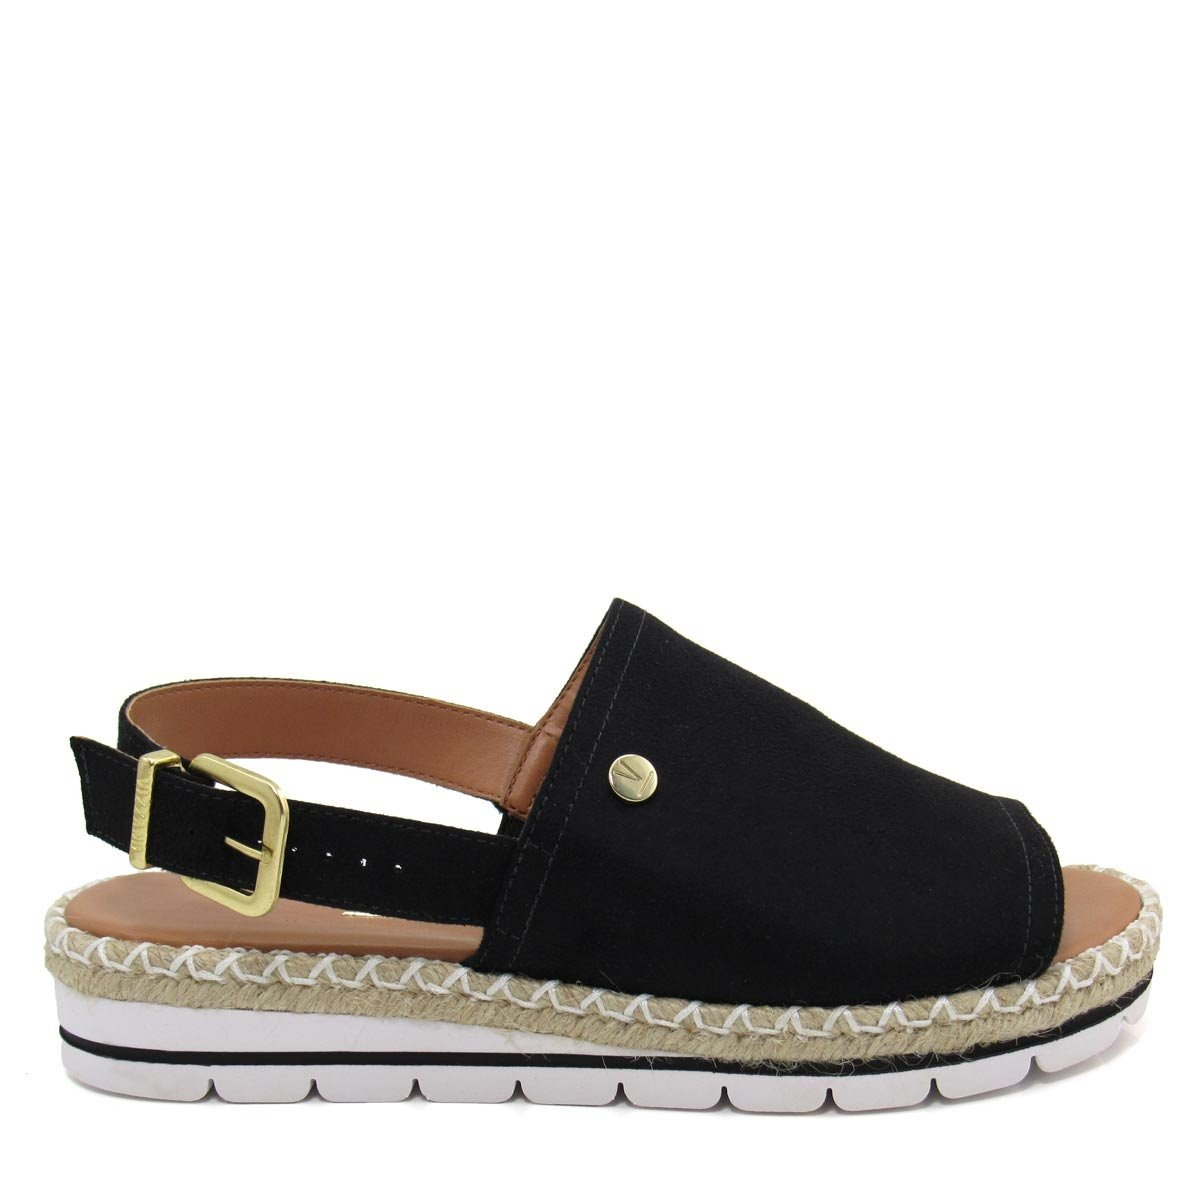 d80ee66d79 sandália flatform feminina avarca vizzano 6388100. Carregando zoom.